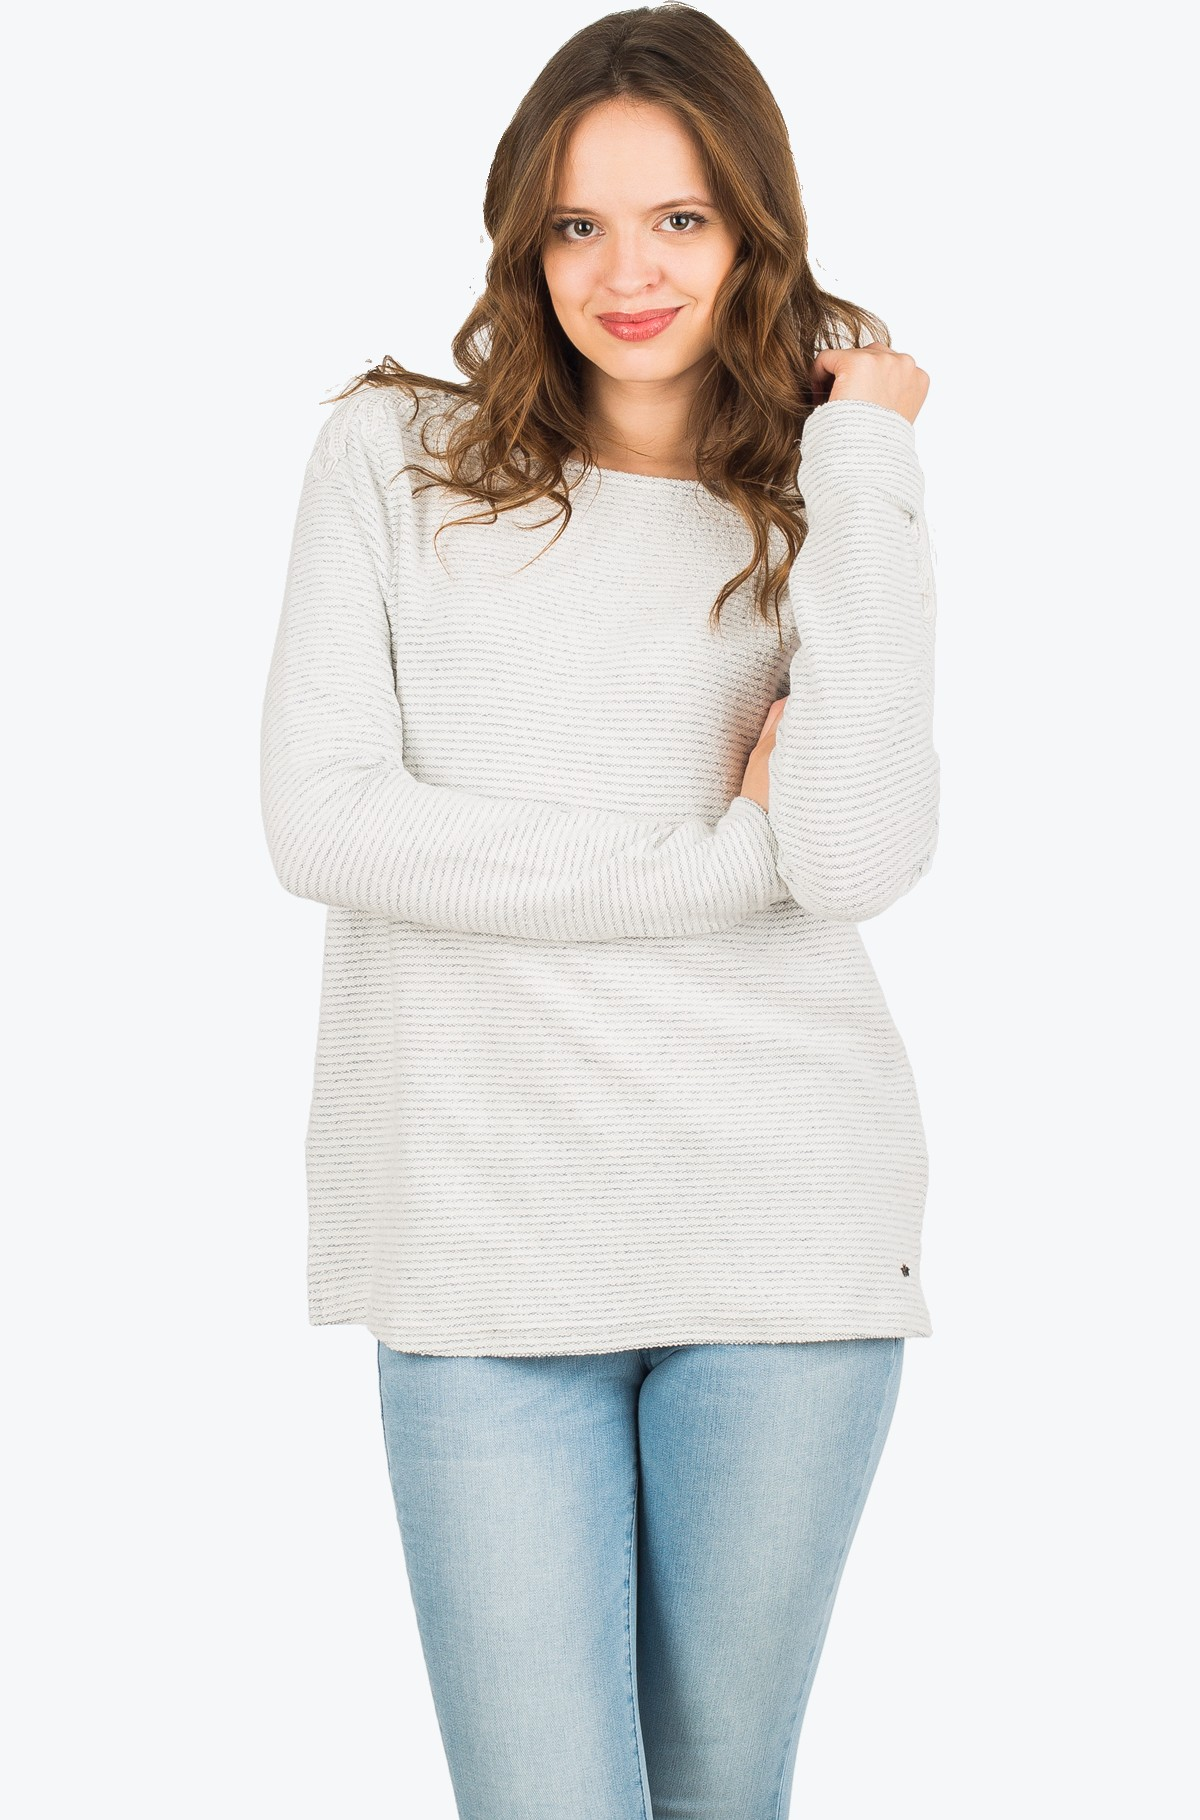 Sweater 6627-1492-full-1